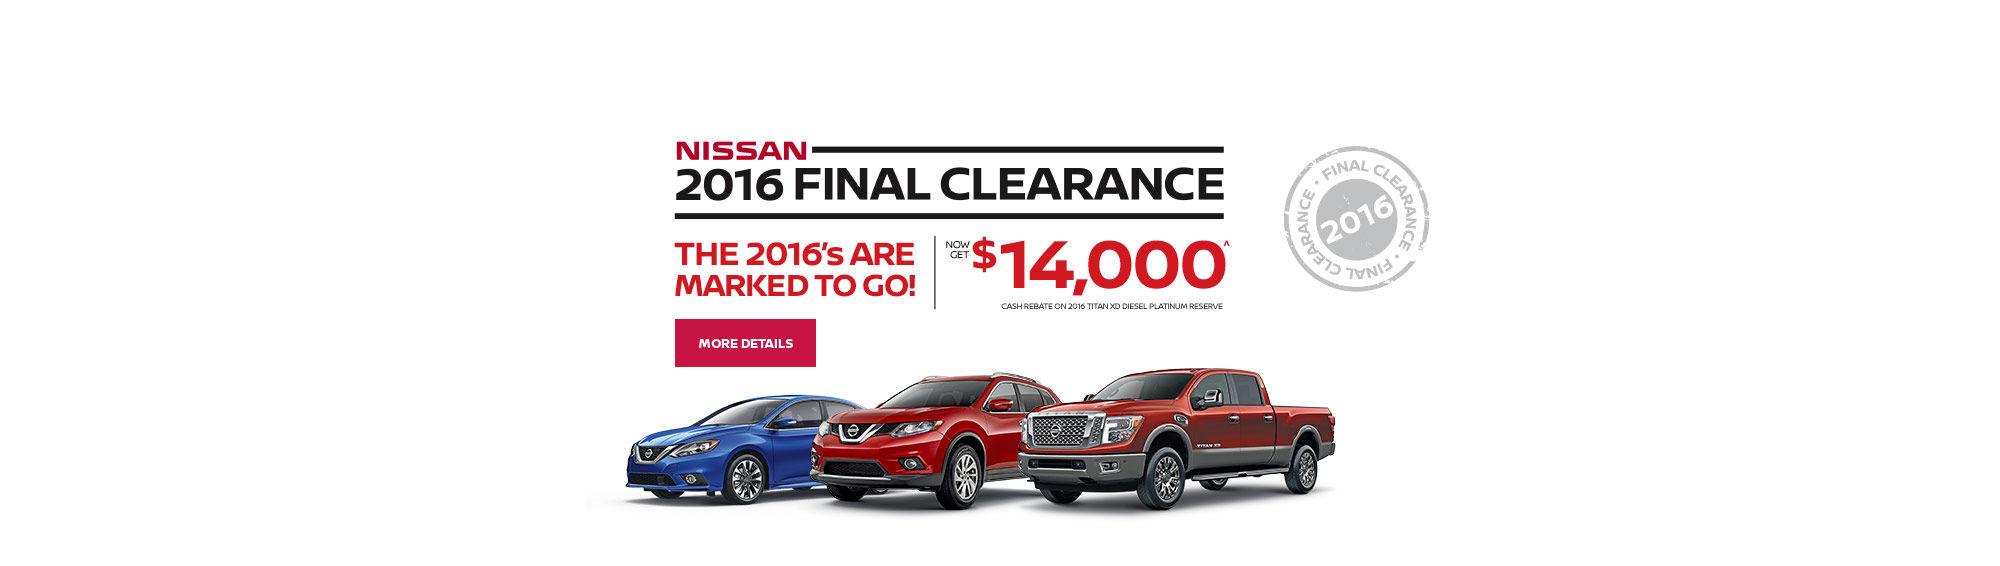 Nissan Final Clearance